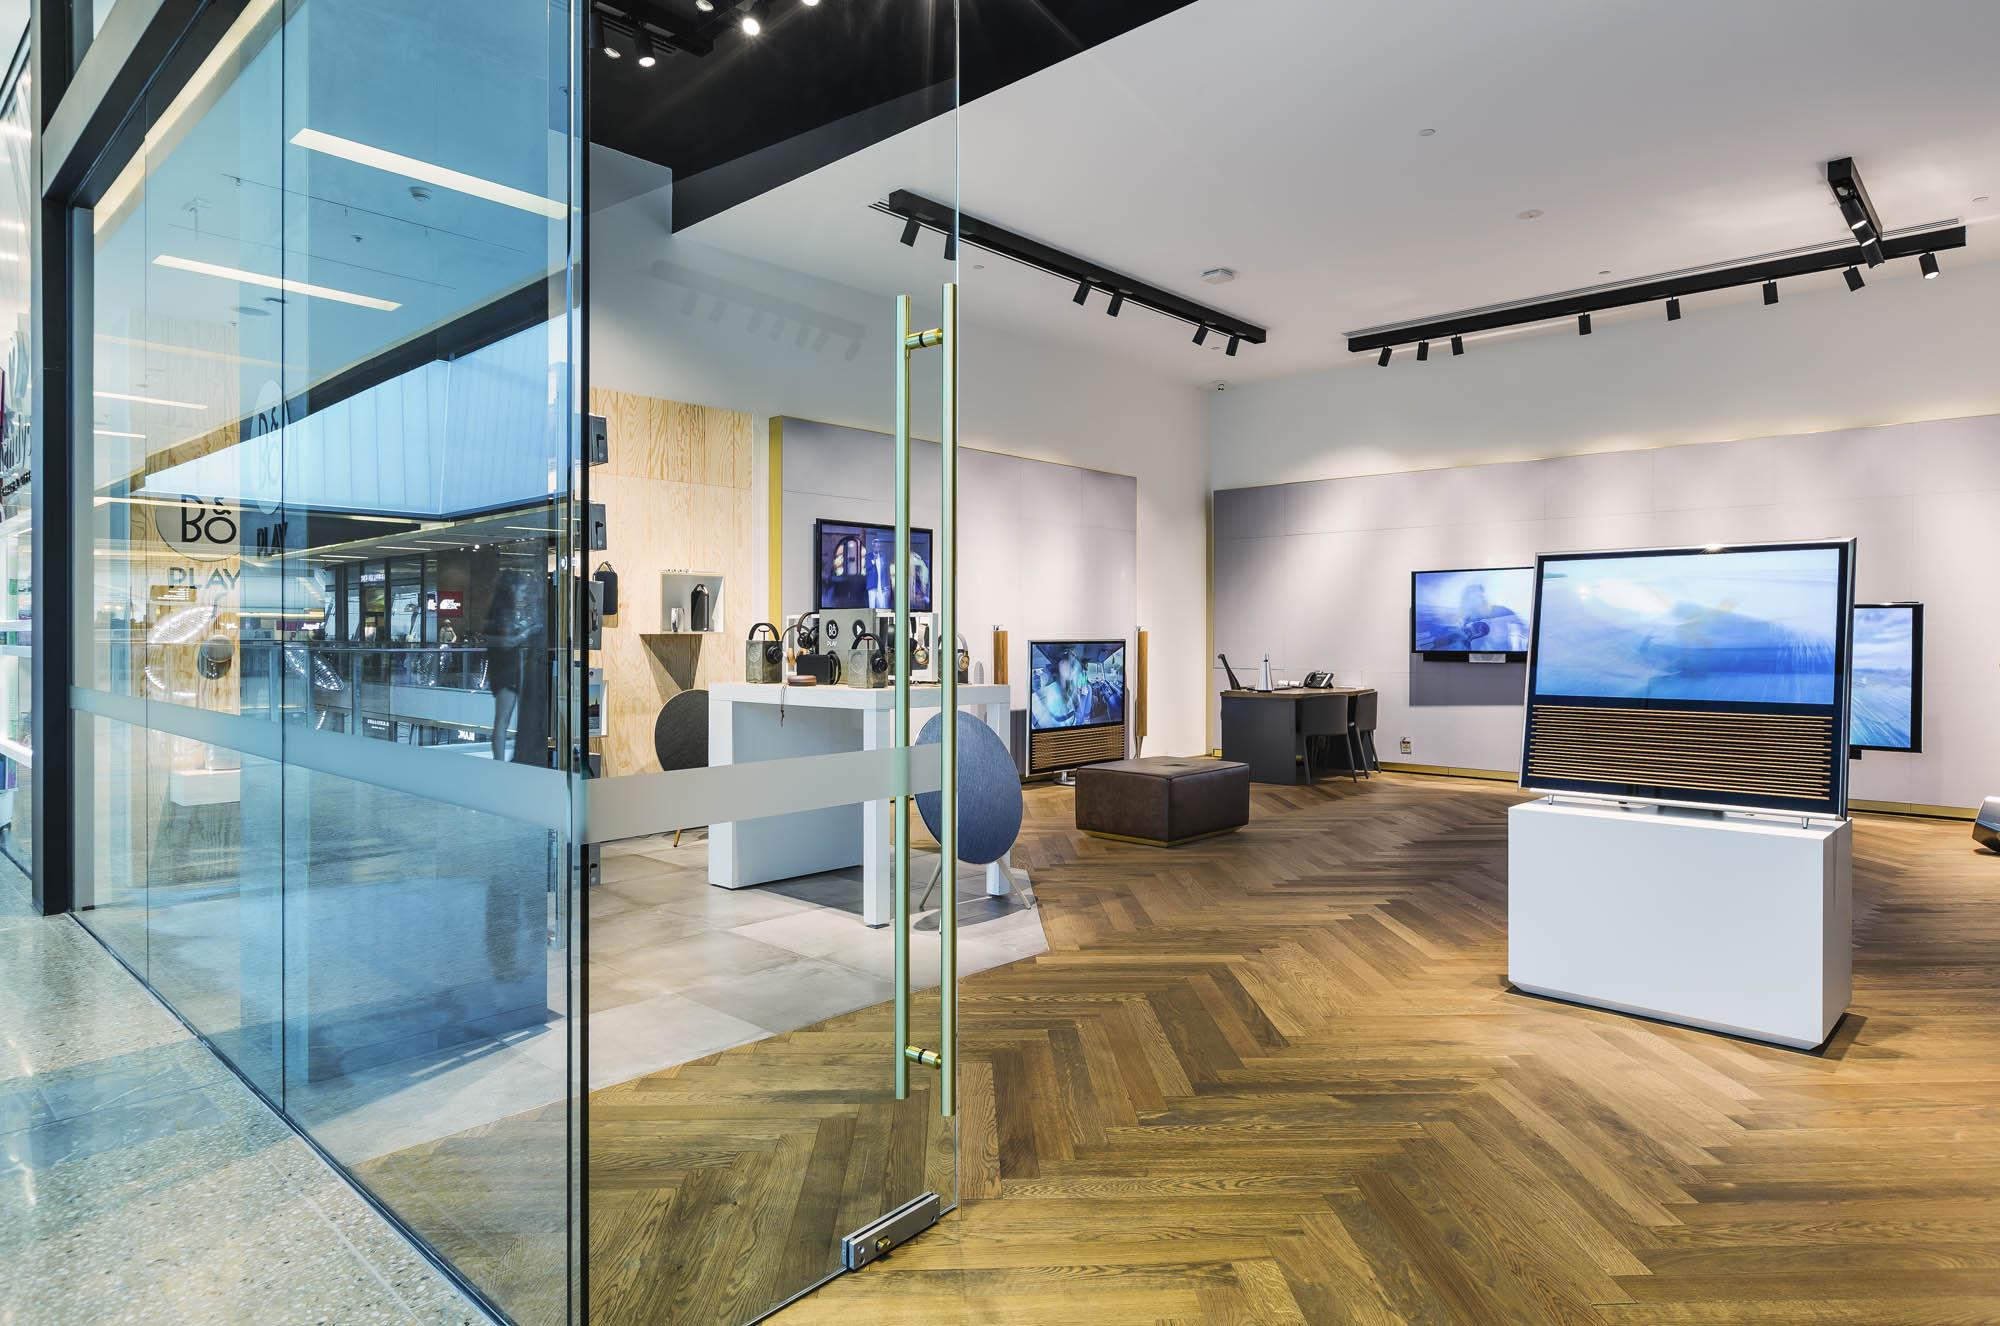 bang and olufsen retail sydney bondi showroom entry doors directional track lighting herringbone floors